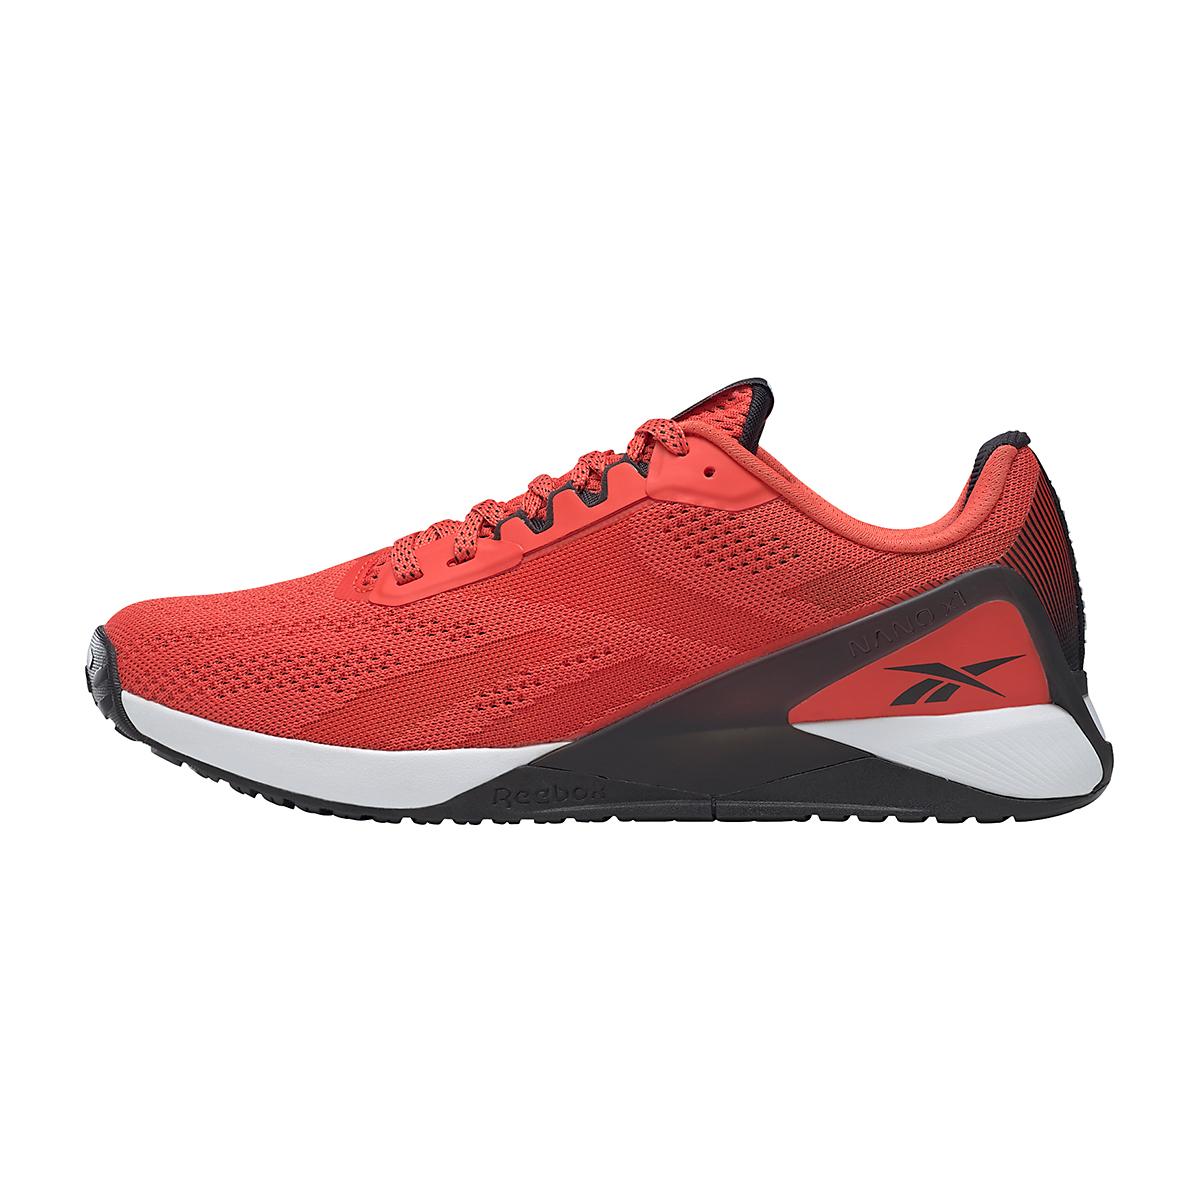 Men's Reebok Nano X1 Training Shoe - Color: Dynamic Red/White/Black - Size: 7 - Width: Regular, Dynamic Red/White/Black, large, image 2